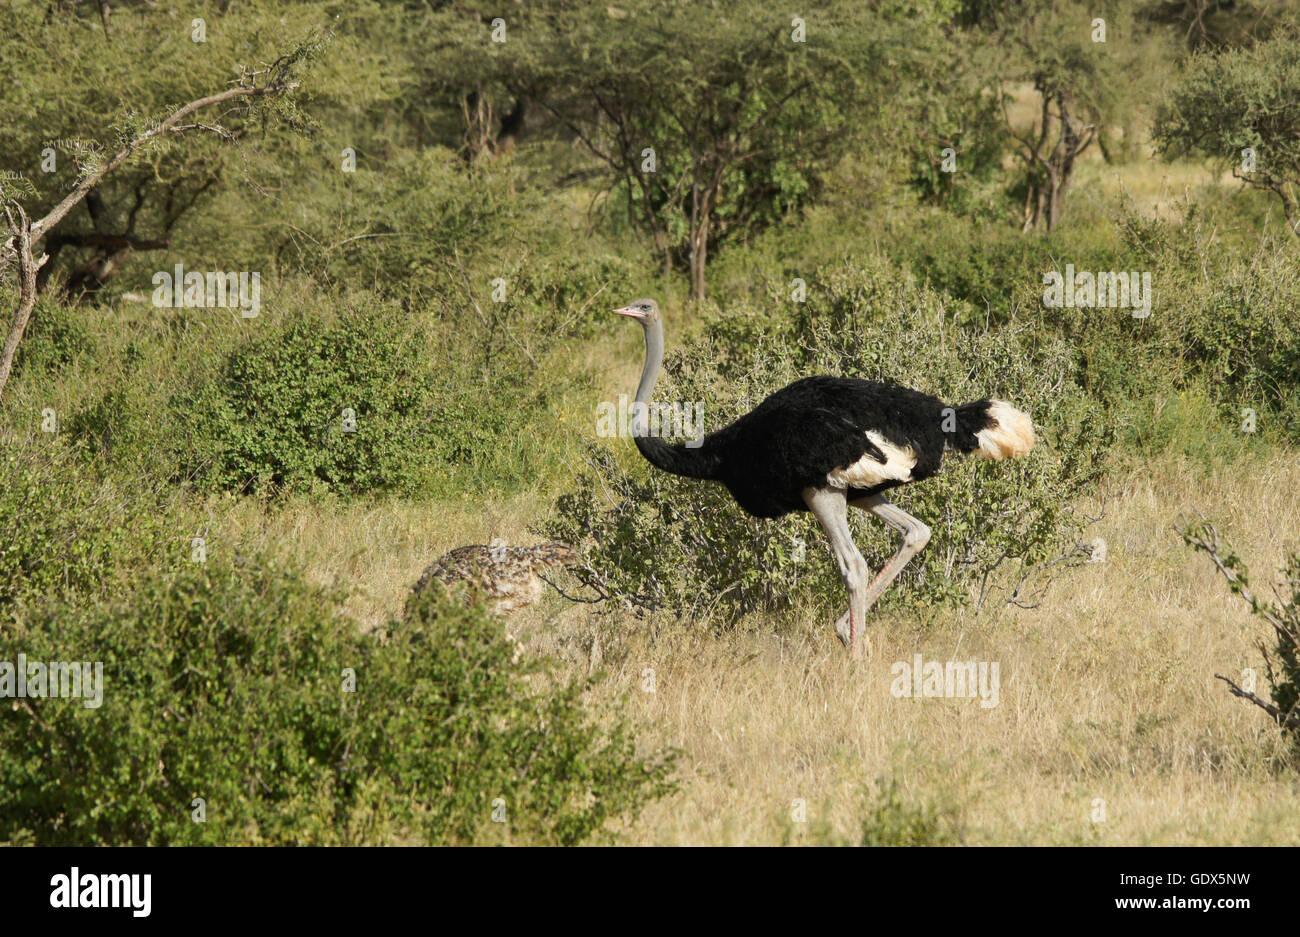 L'autruche somalienne mâle avec de jeunes enfants, Samburu Game Reserve, Kenya Photo Stock